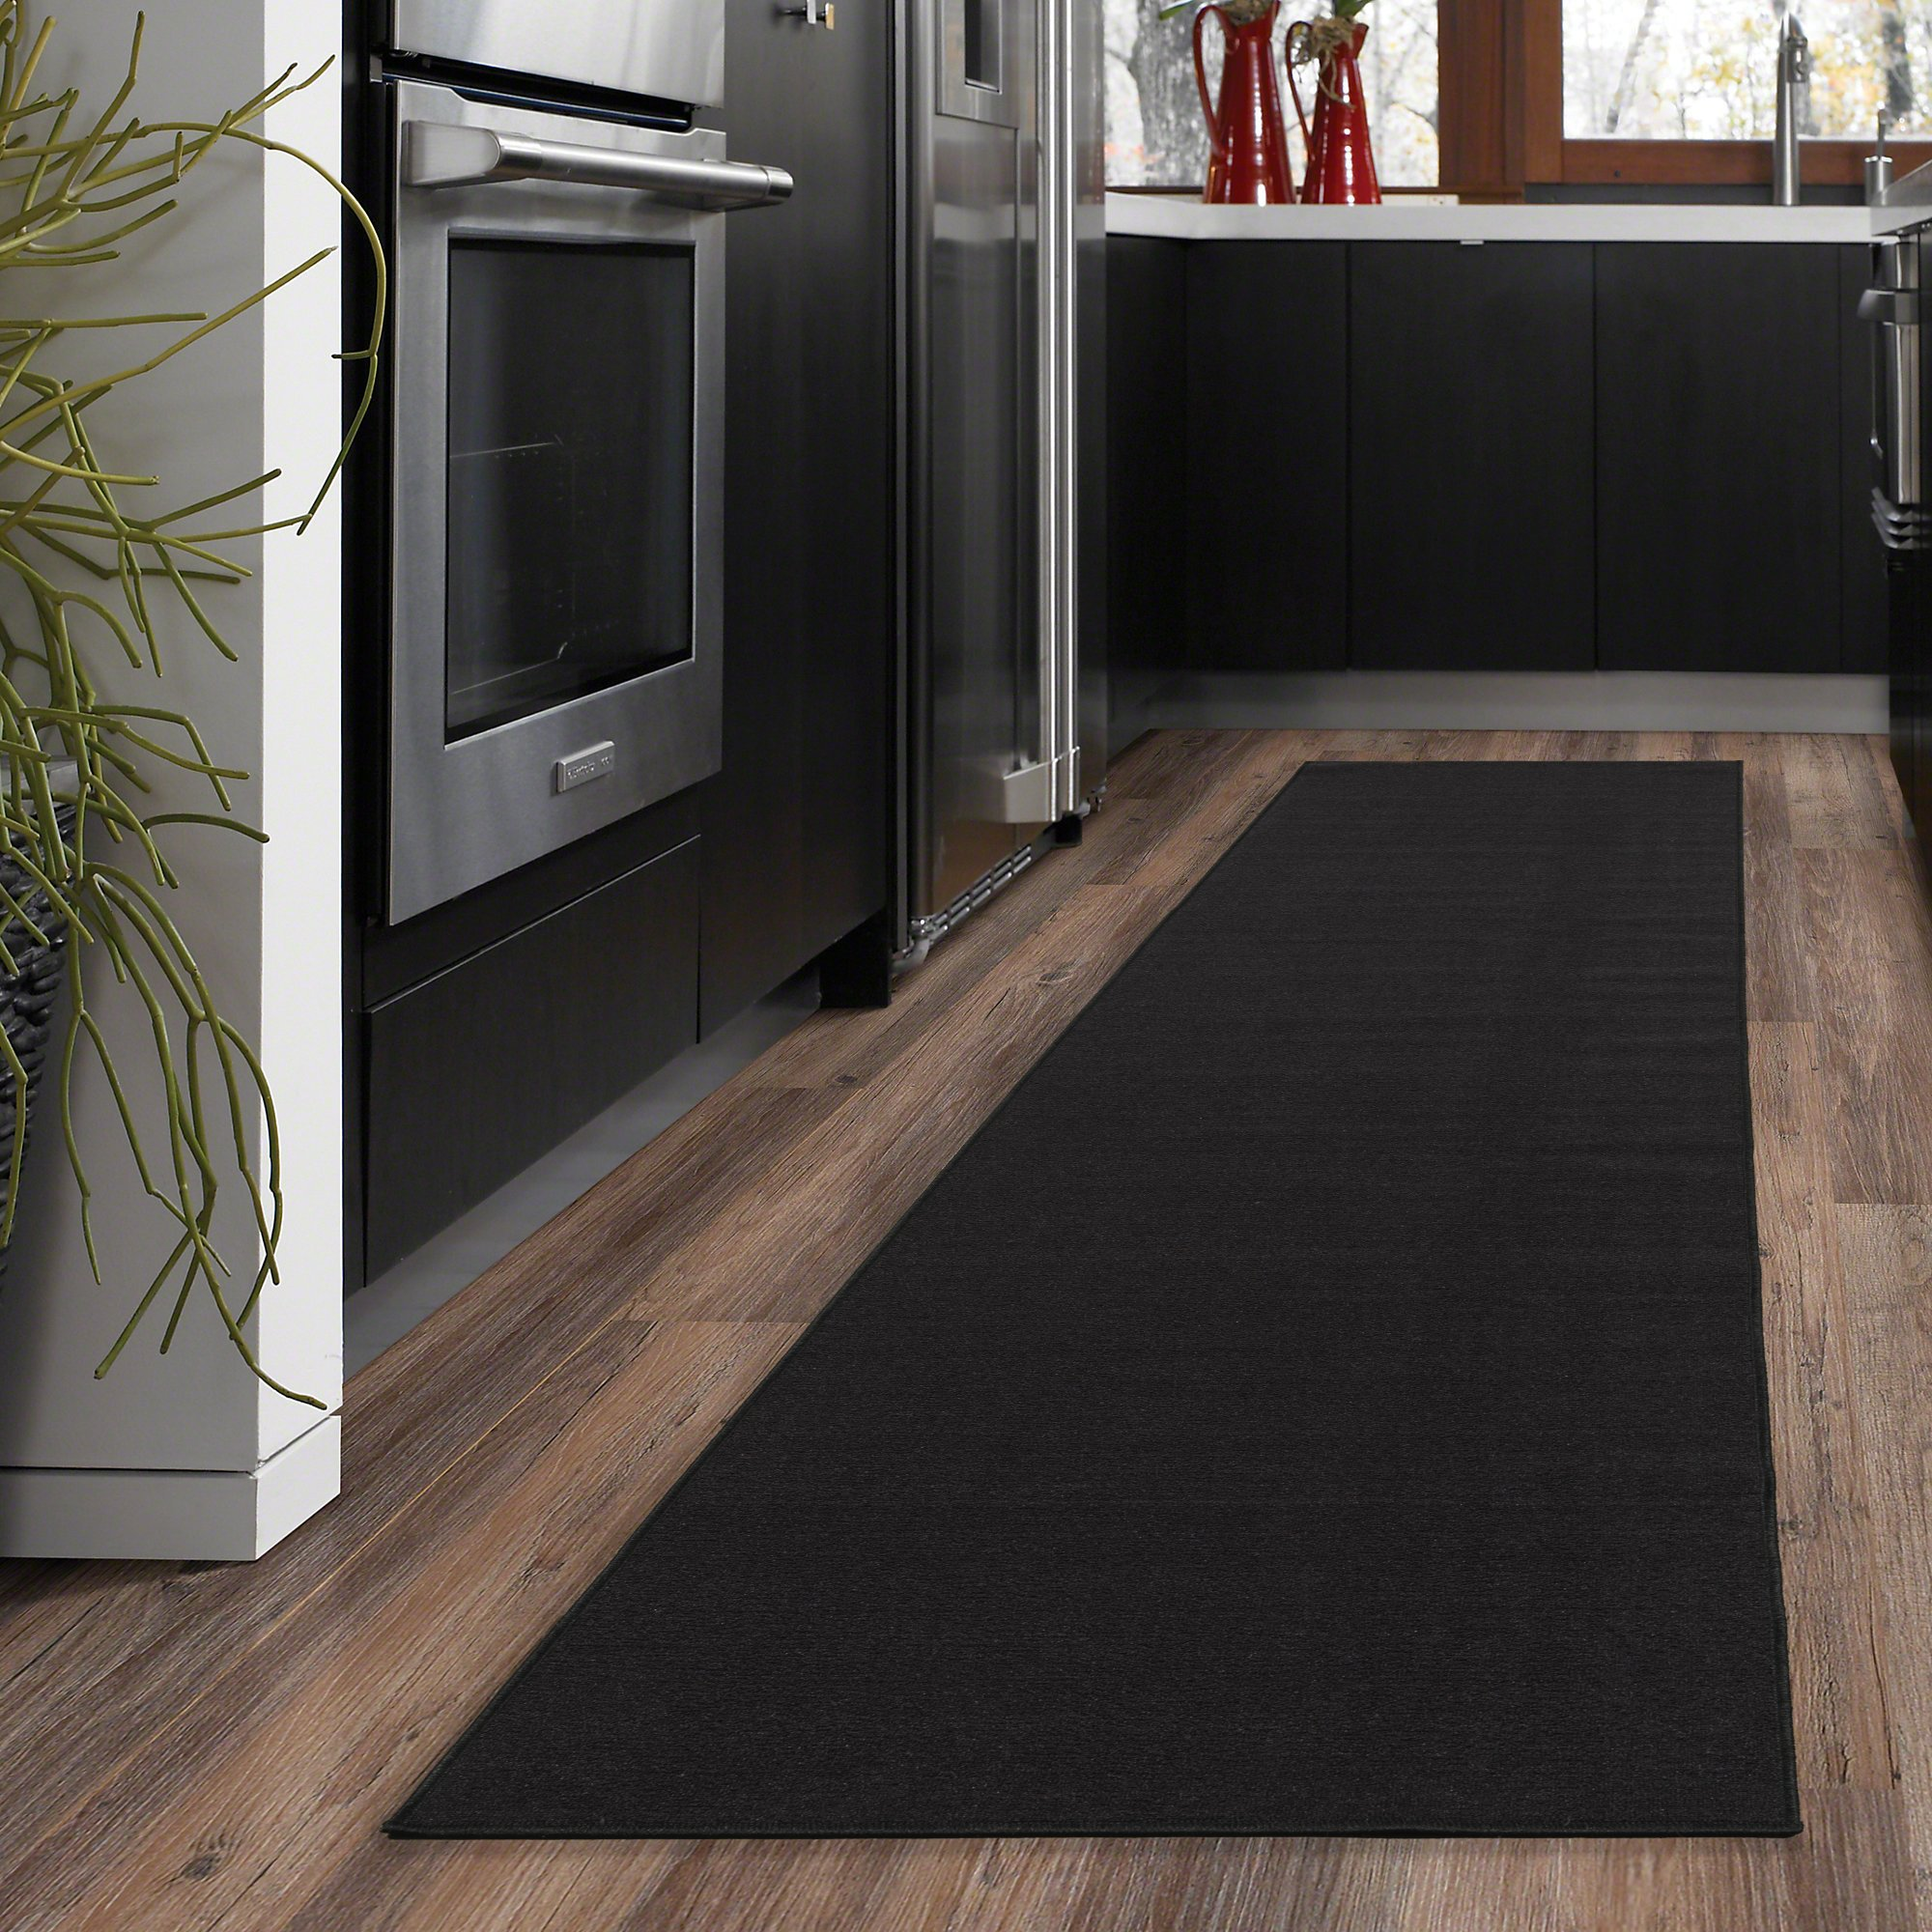 Ottomanson Ottohome Collection Solid Design Hallway Kitchen Runner Rug (Non-Slip) Rubber Backing Area Rug, 20'' X 59'', Black